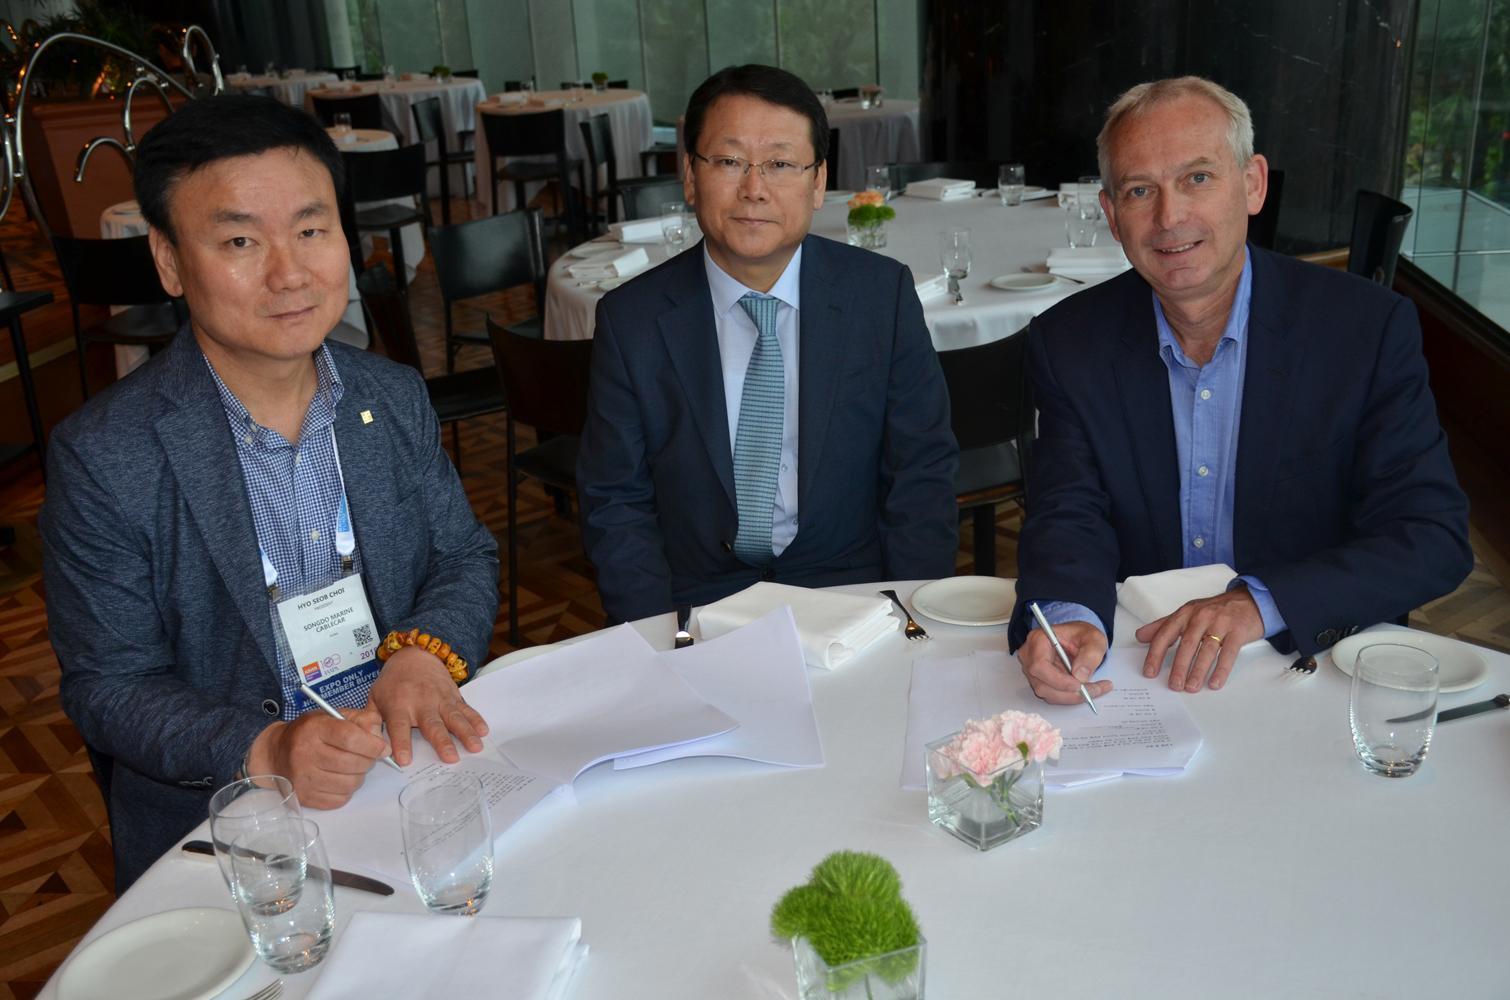 Choi Hyo Seob, president of Busan Air Cruise, and Choi Sam Seob, chairman of Busan Air Cruise, with Picsolve CEO David Hockley